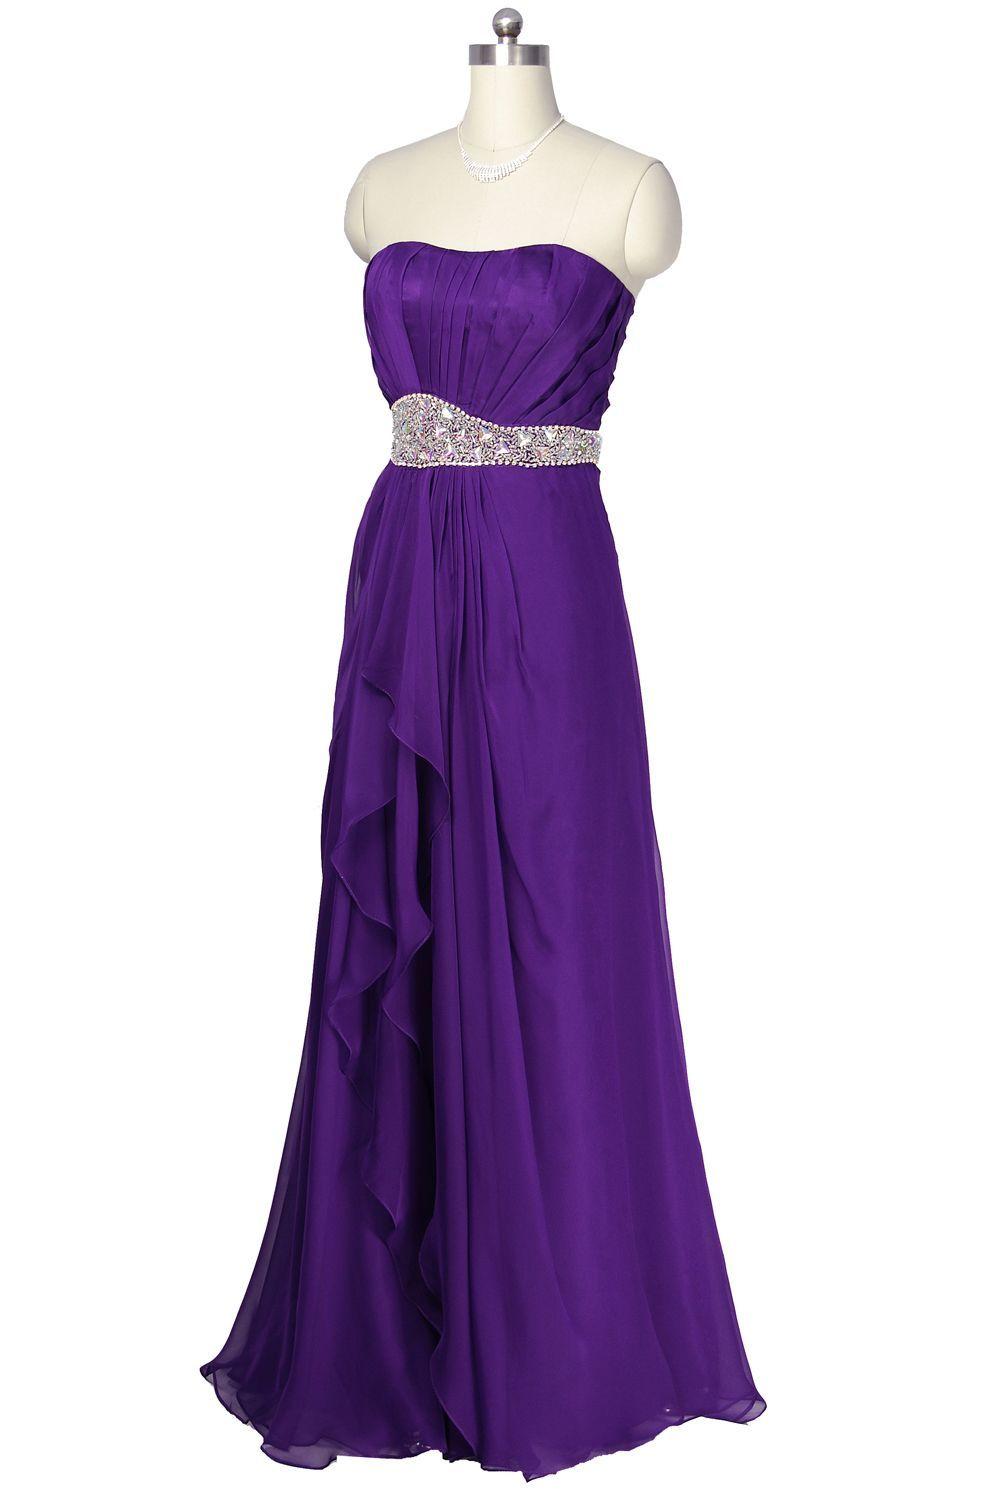 Purple chiffon bridesmaid dresses purple luxury design chiffon